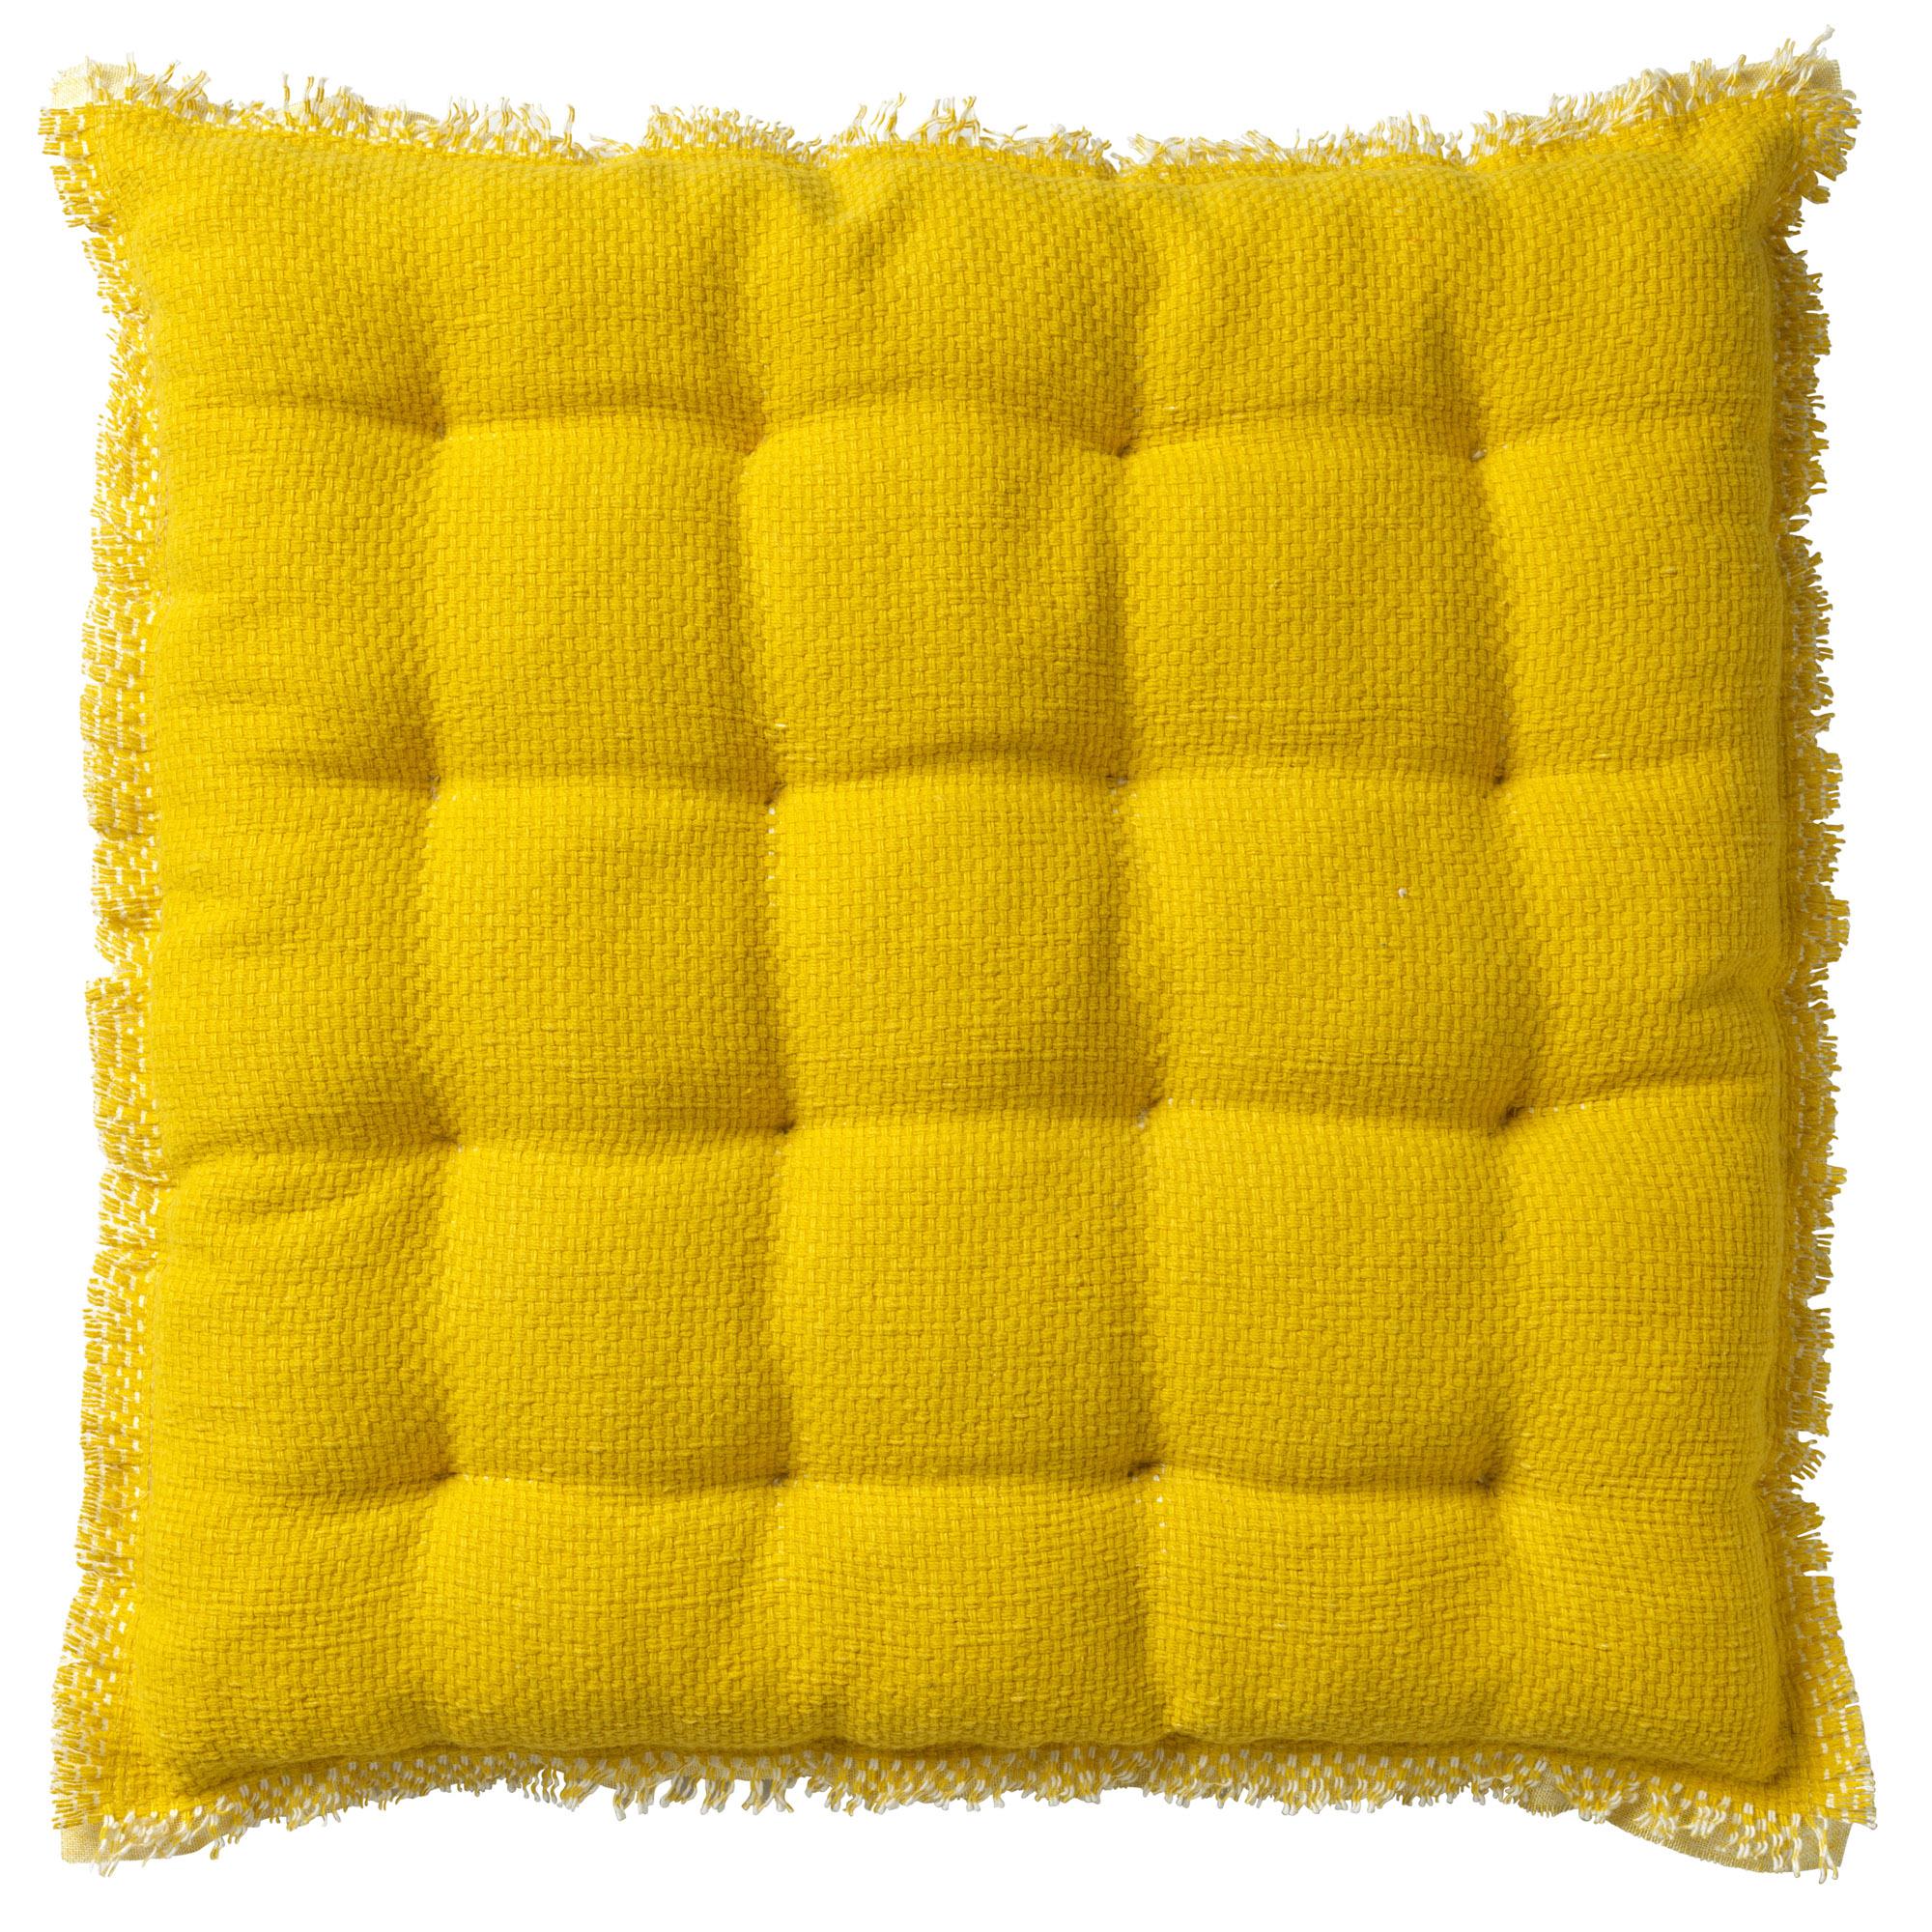 Burto Jaune citron 40x40